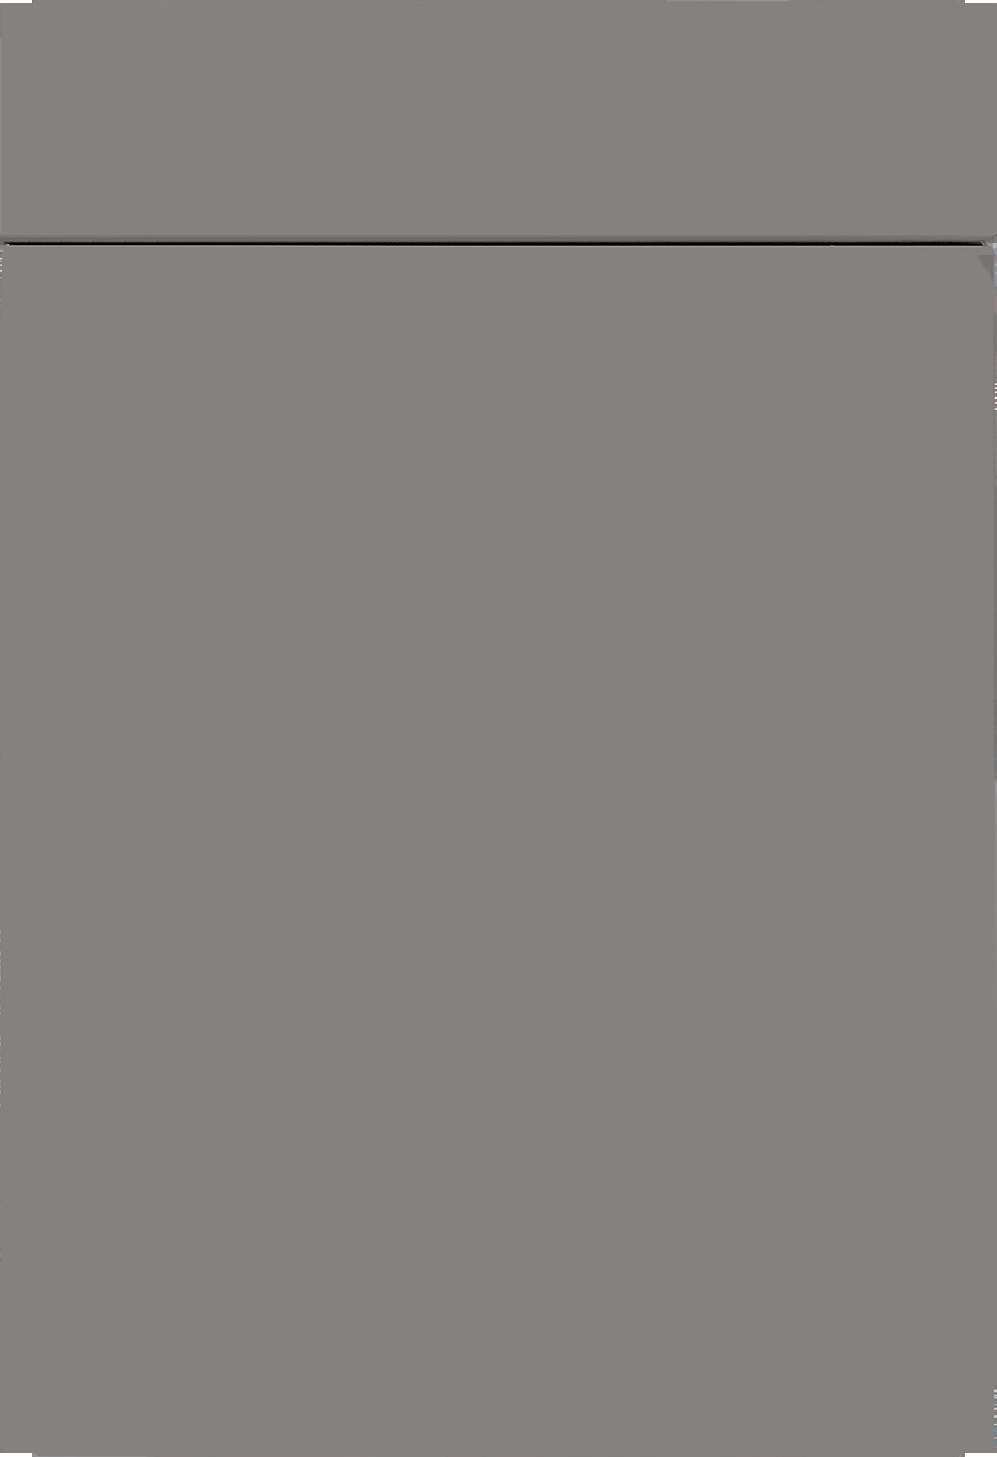 Façade gris agate mat soyeux